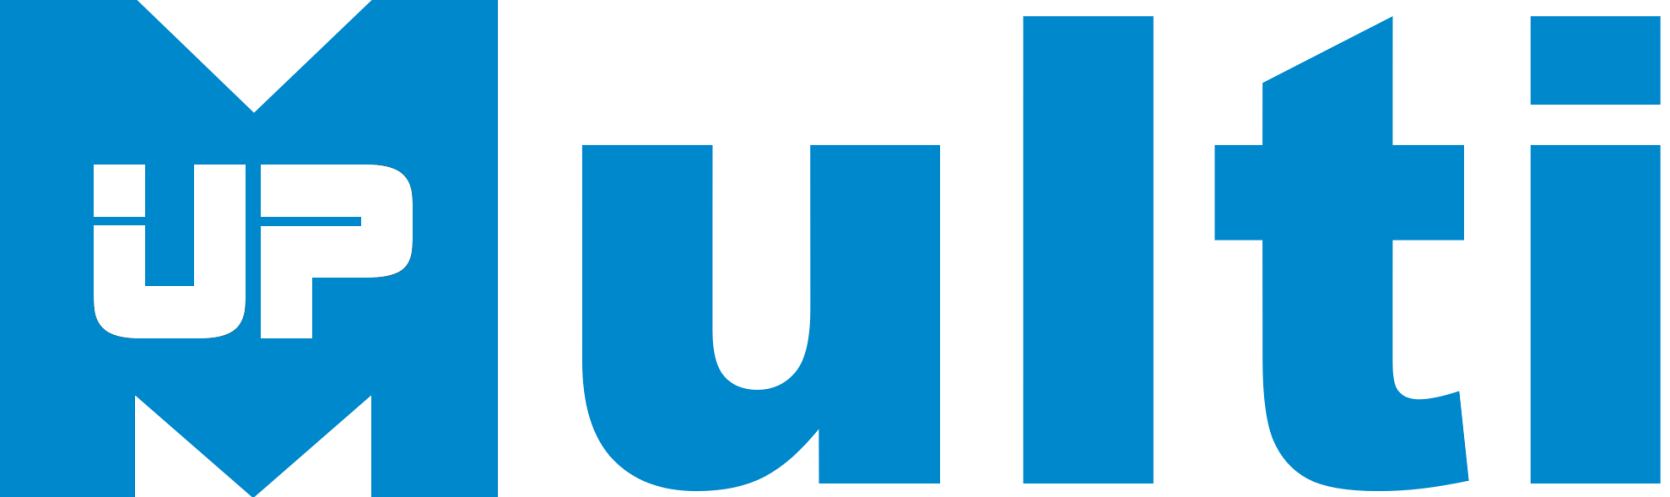 multiup.org banner png 1670x500